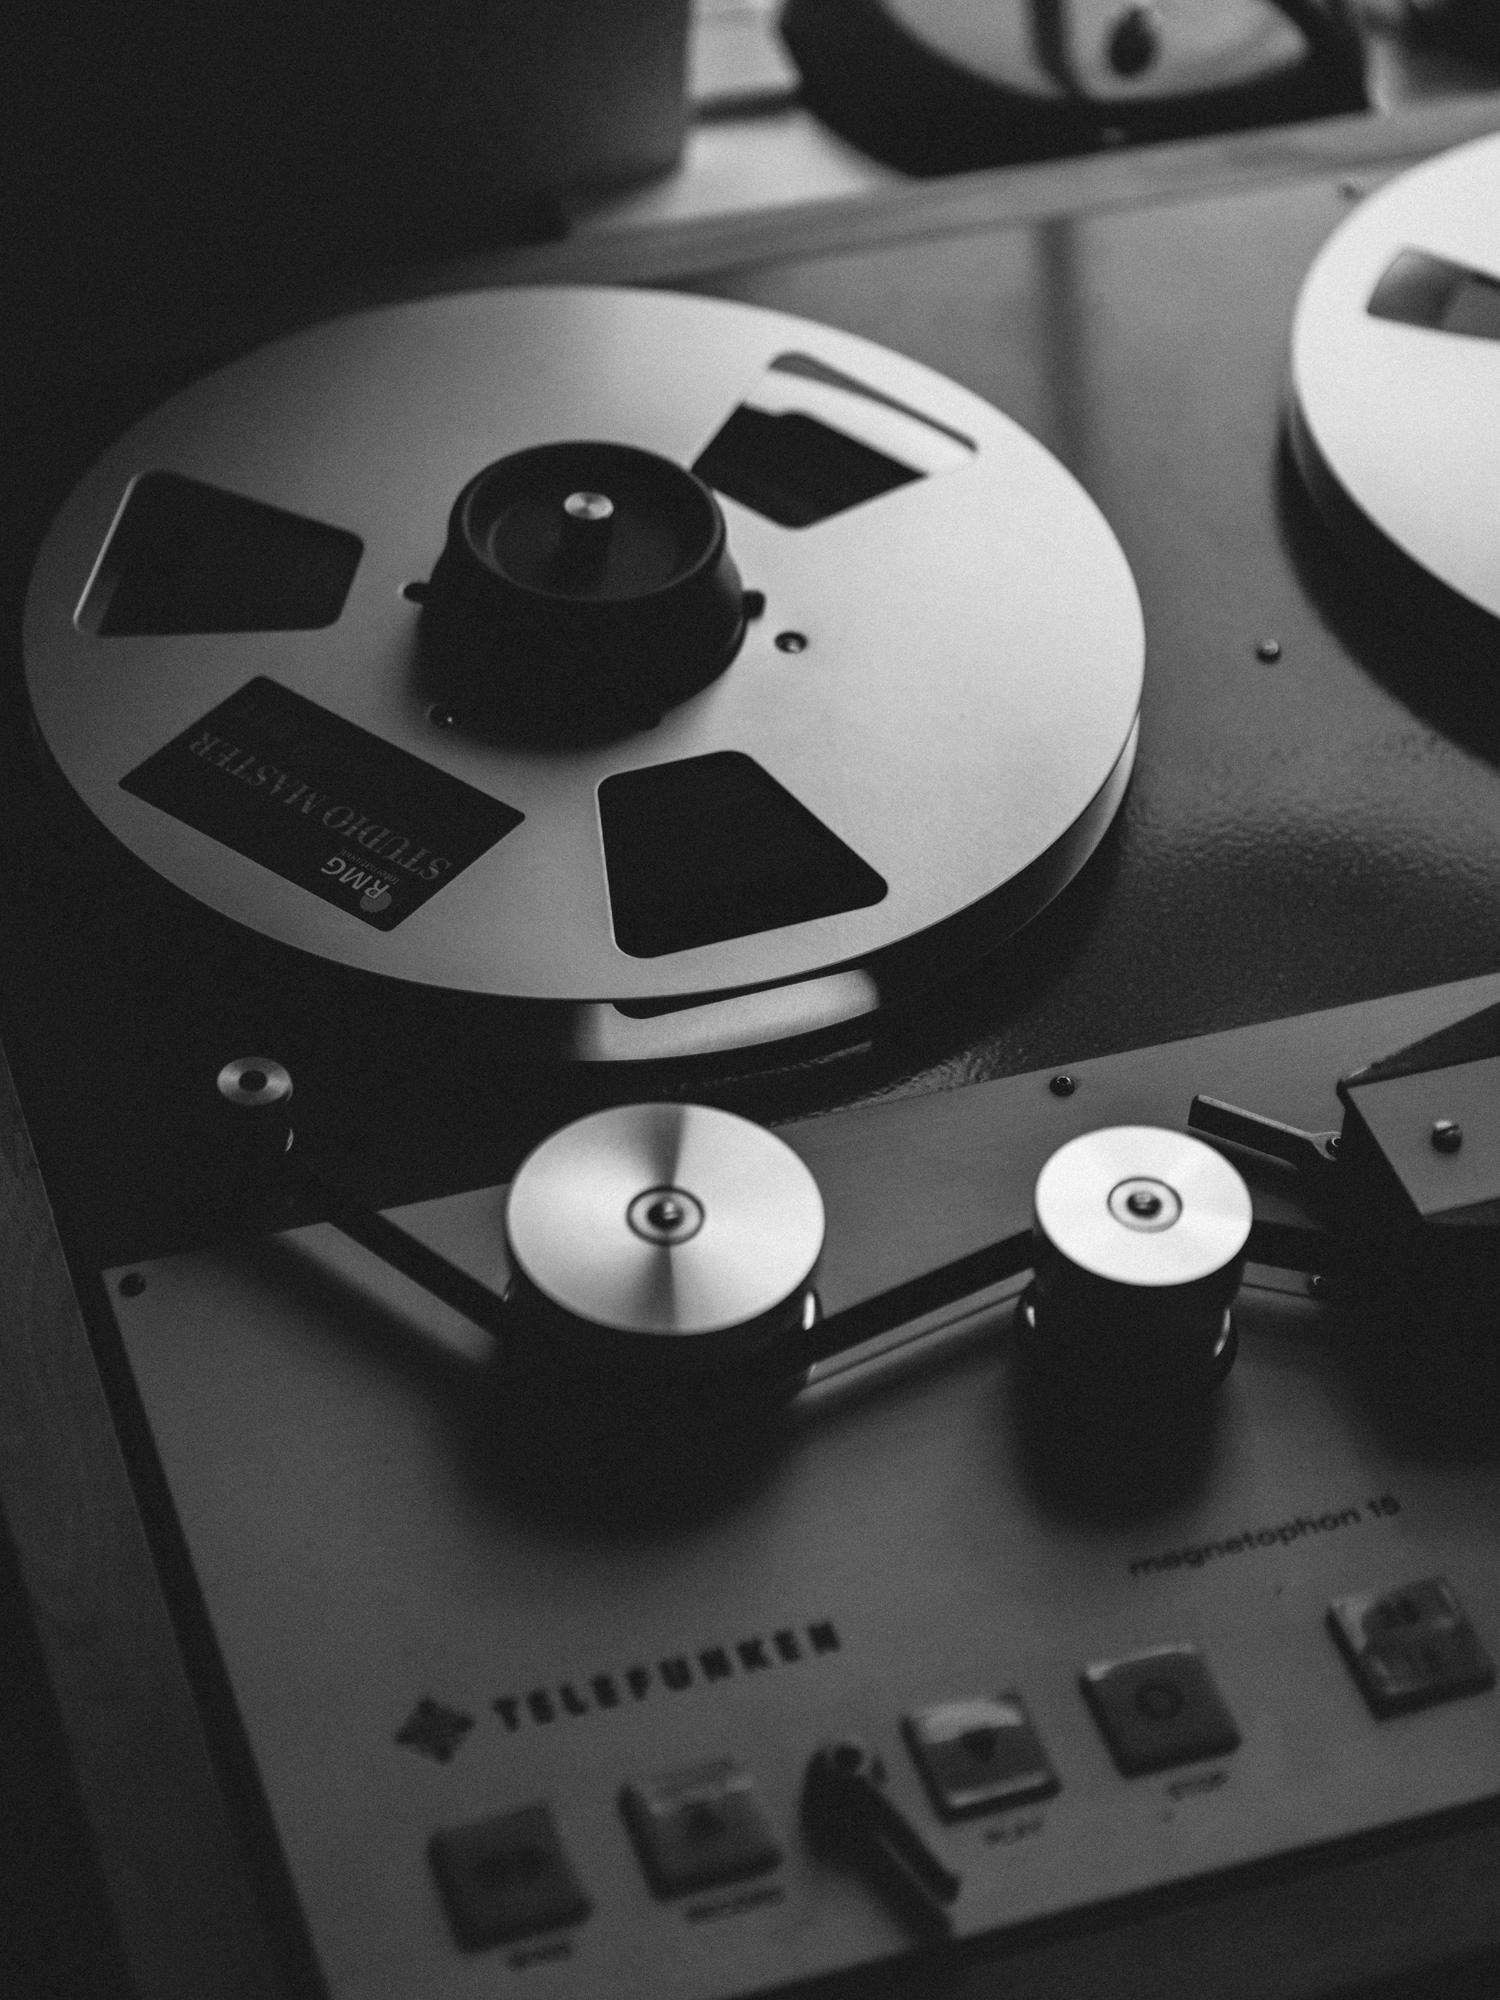 Tape machine of Nils Frahm in his production studio in Berlin.